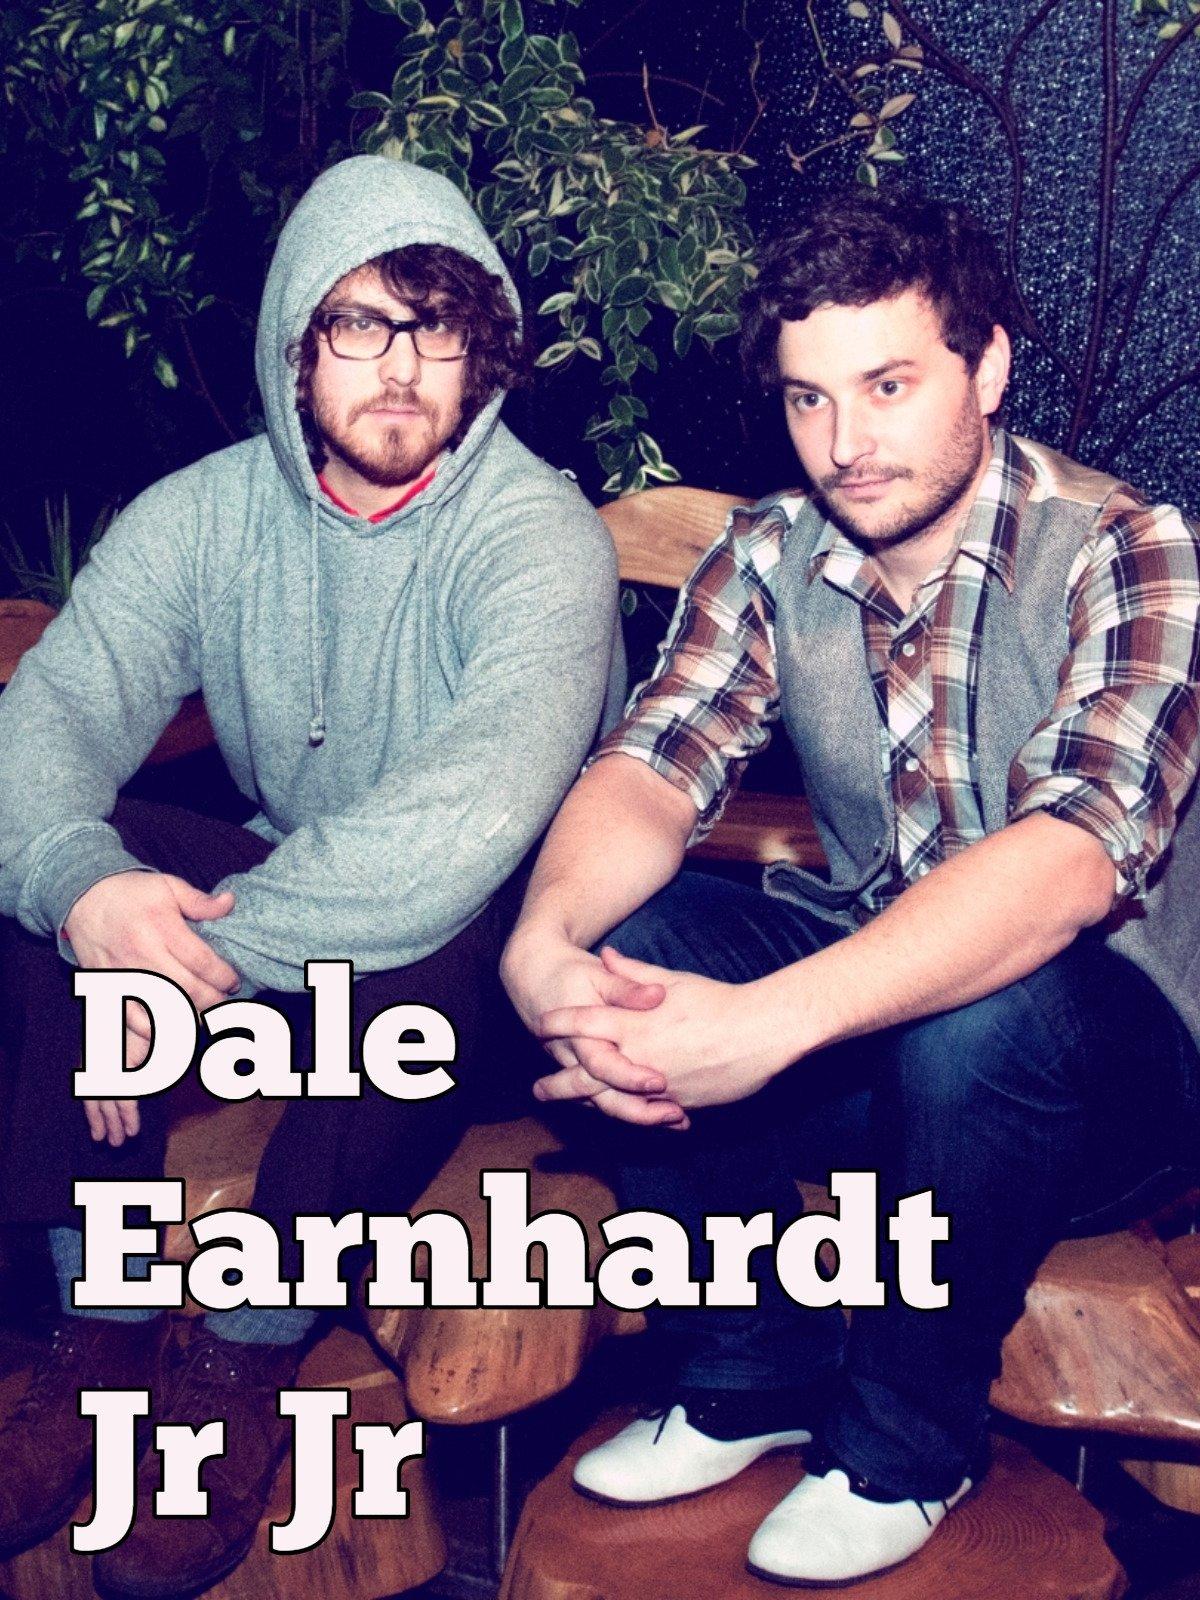 A Session with Dale Earnhardt Jr Jr